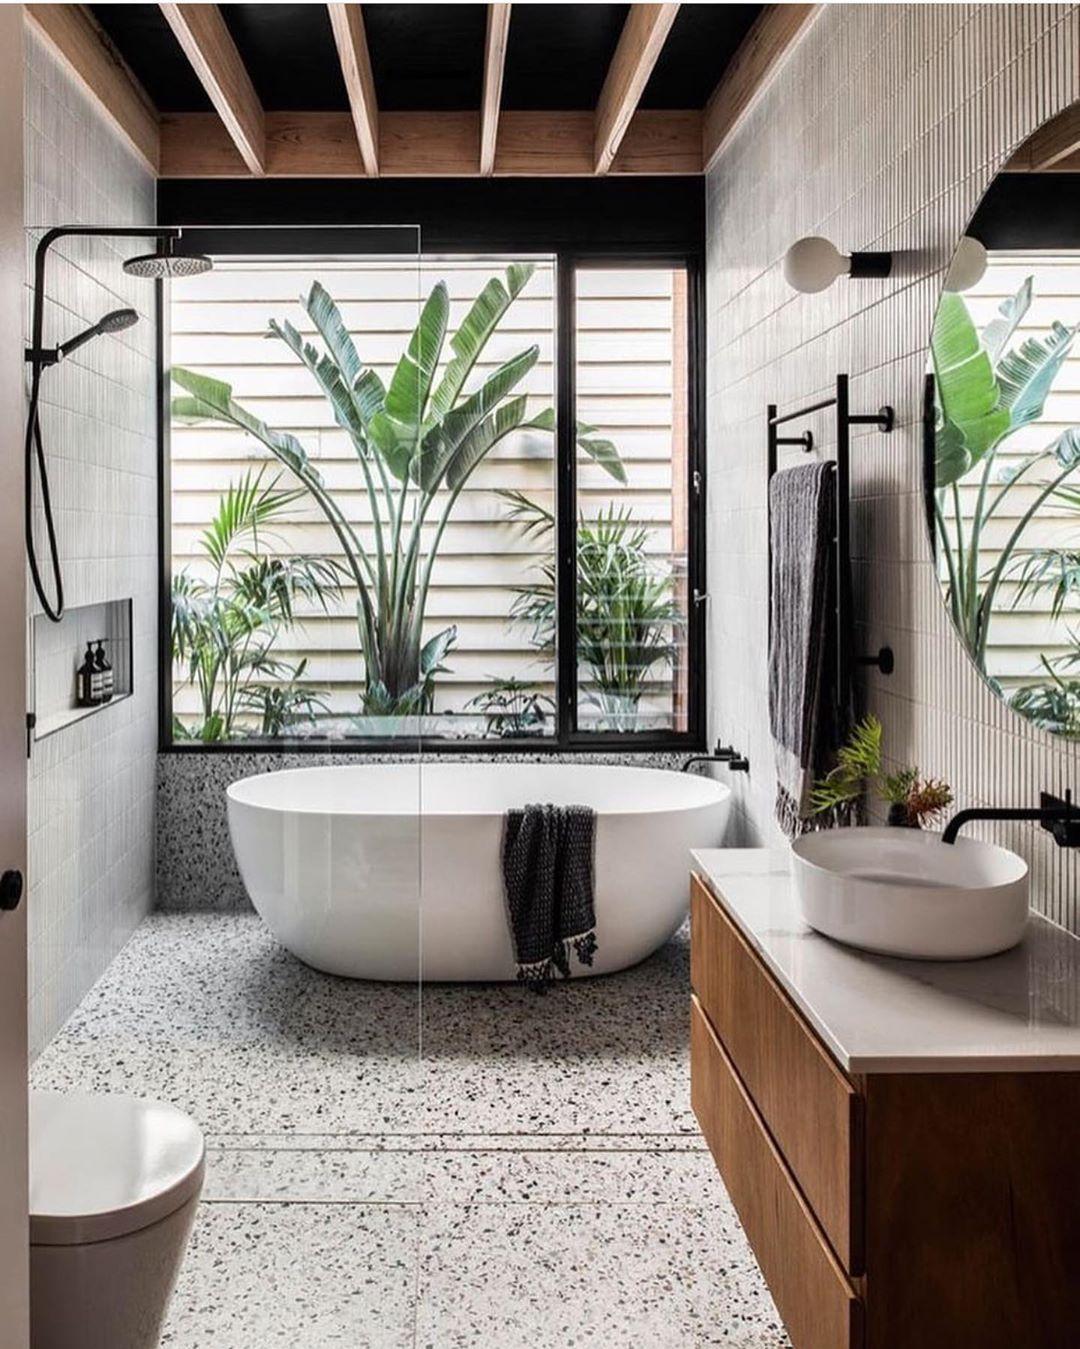 Vibeke J Dyremyhr On Instagram Bathroom Inspo Don T Miss